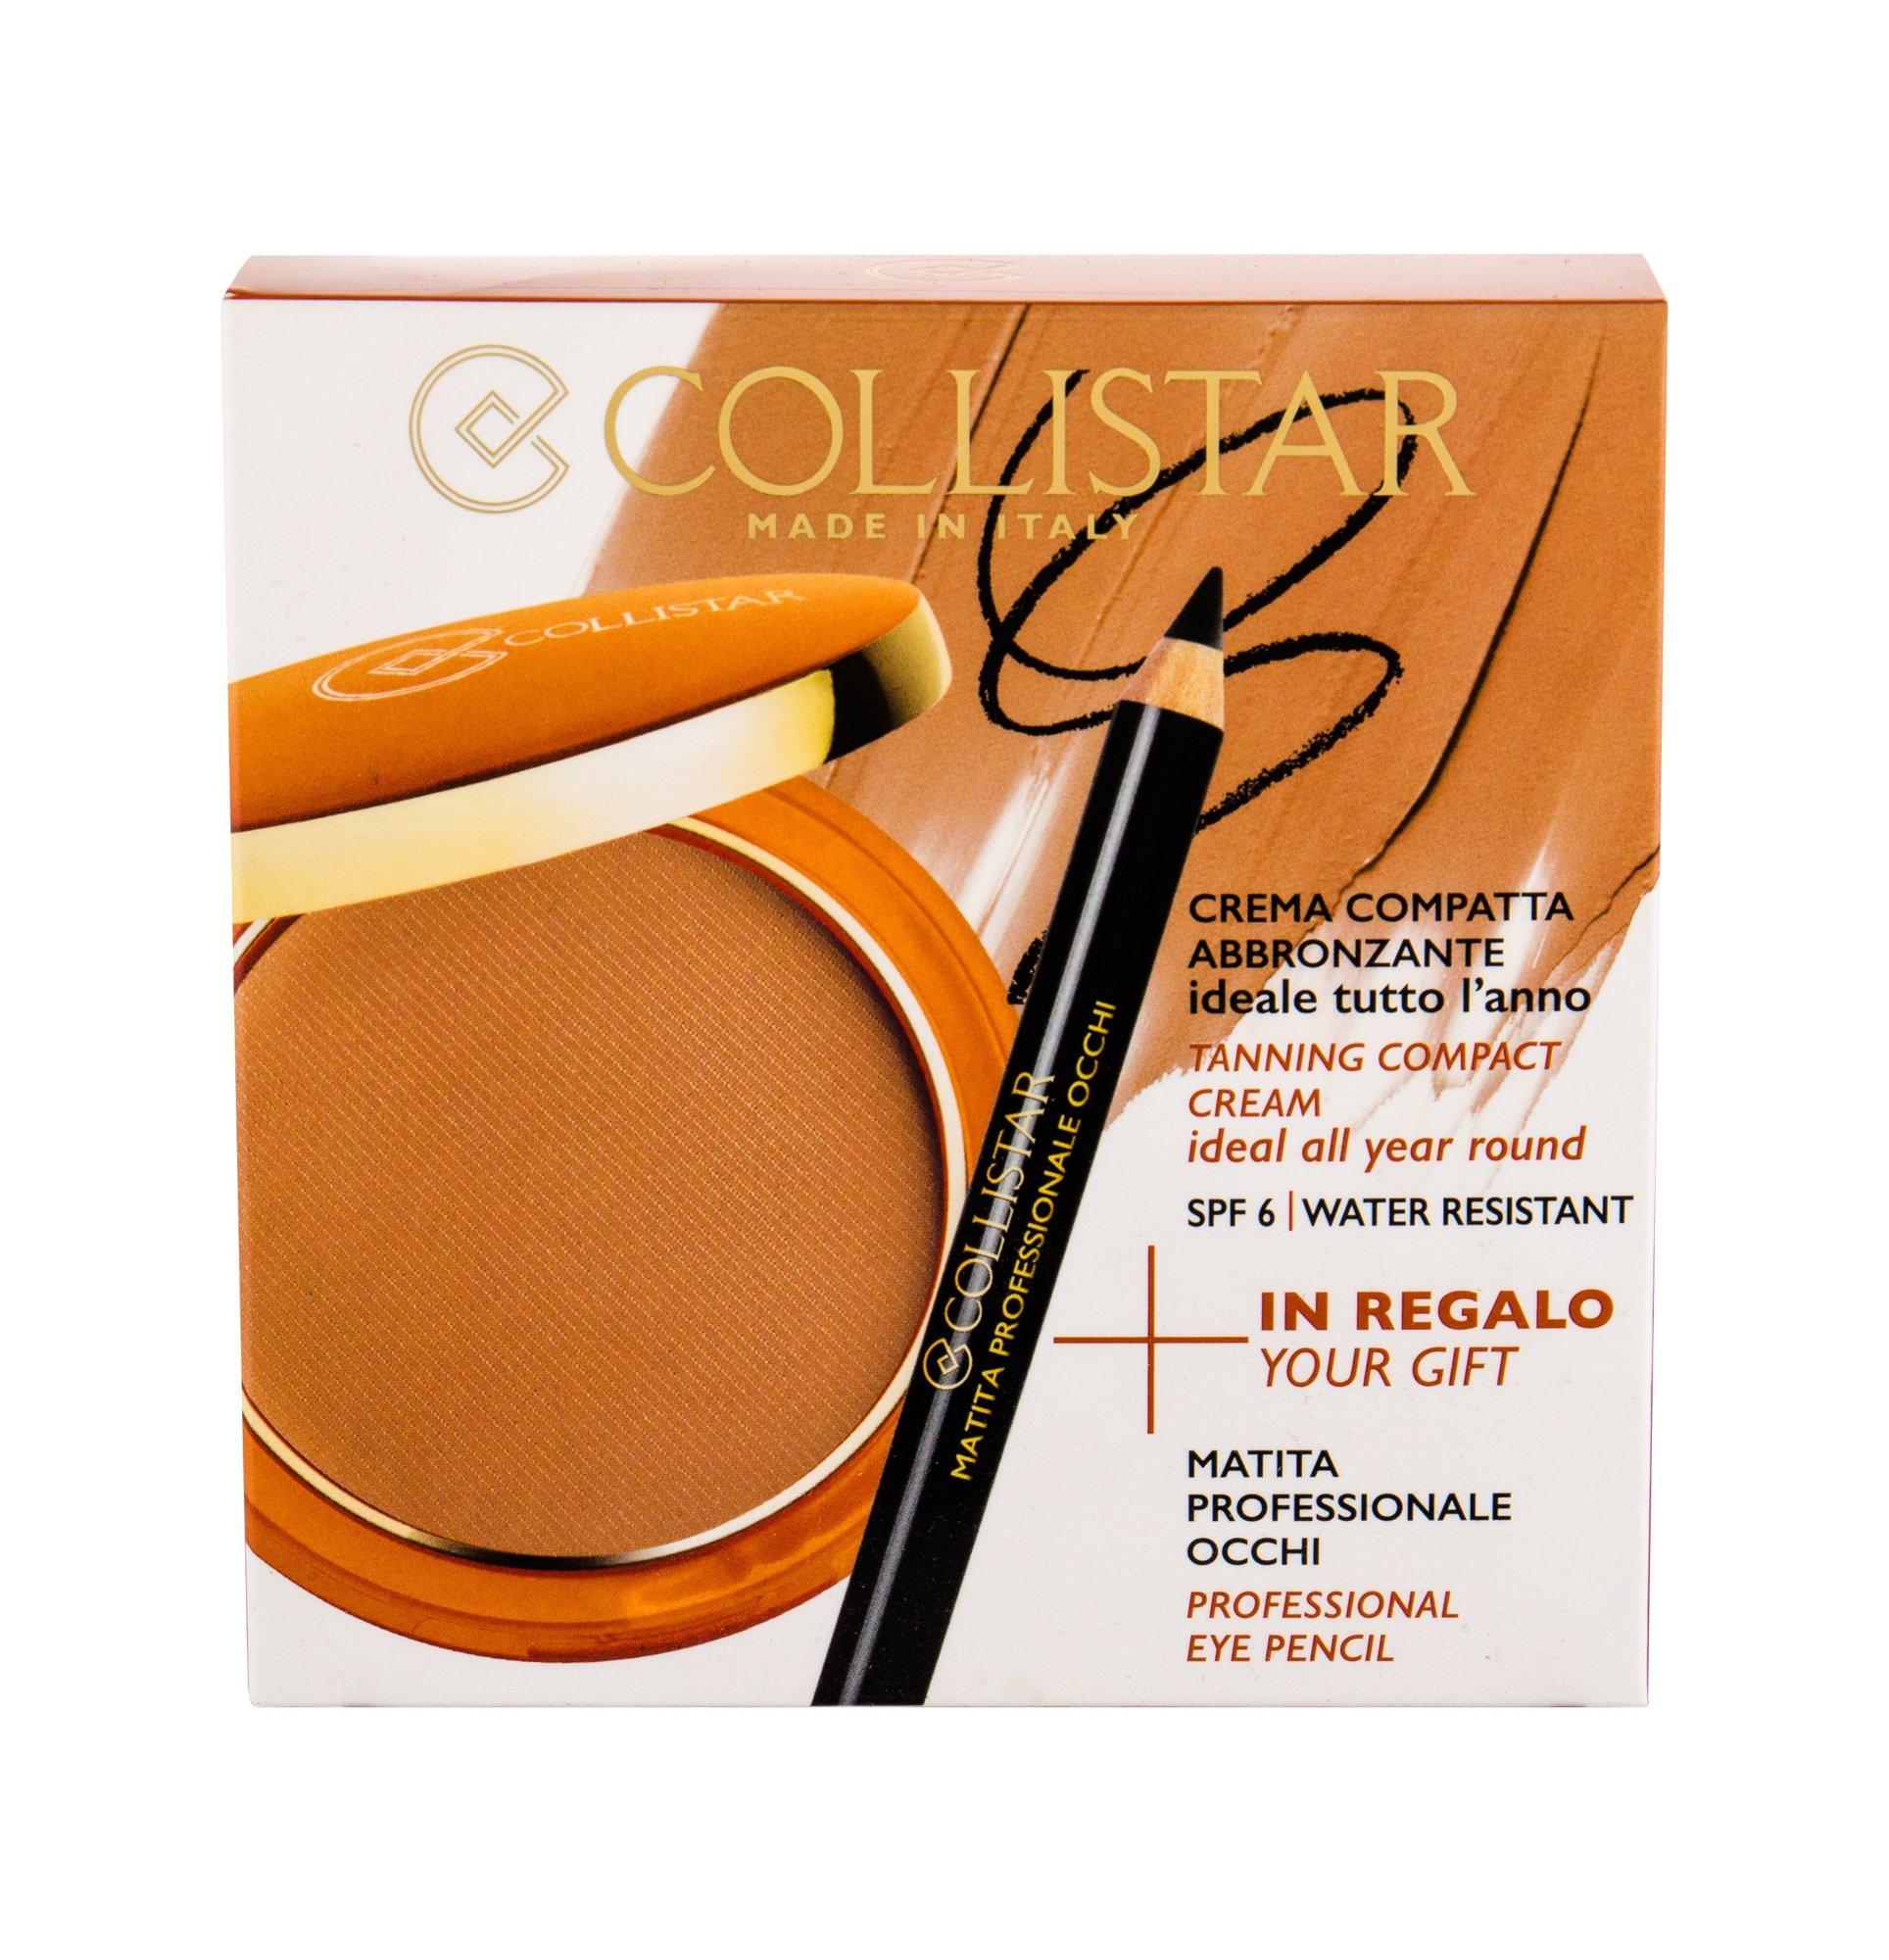 Collistar Tanning Compact Cream Powder 9ml 2 Bahamas